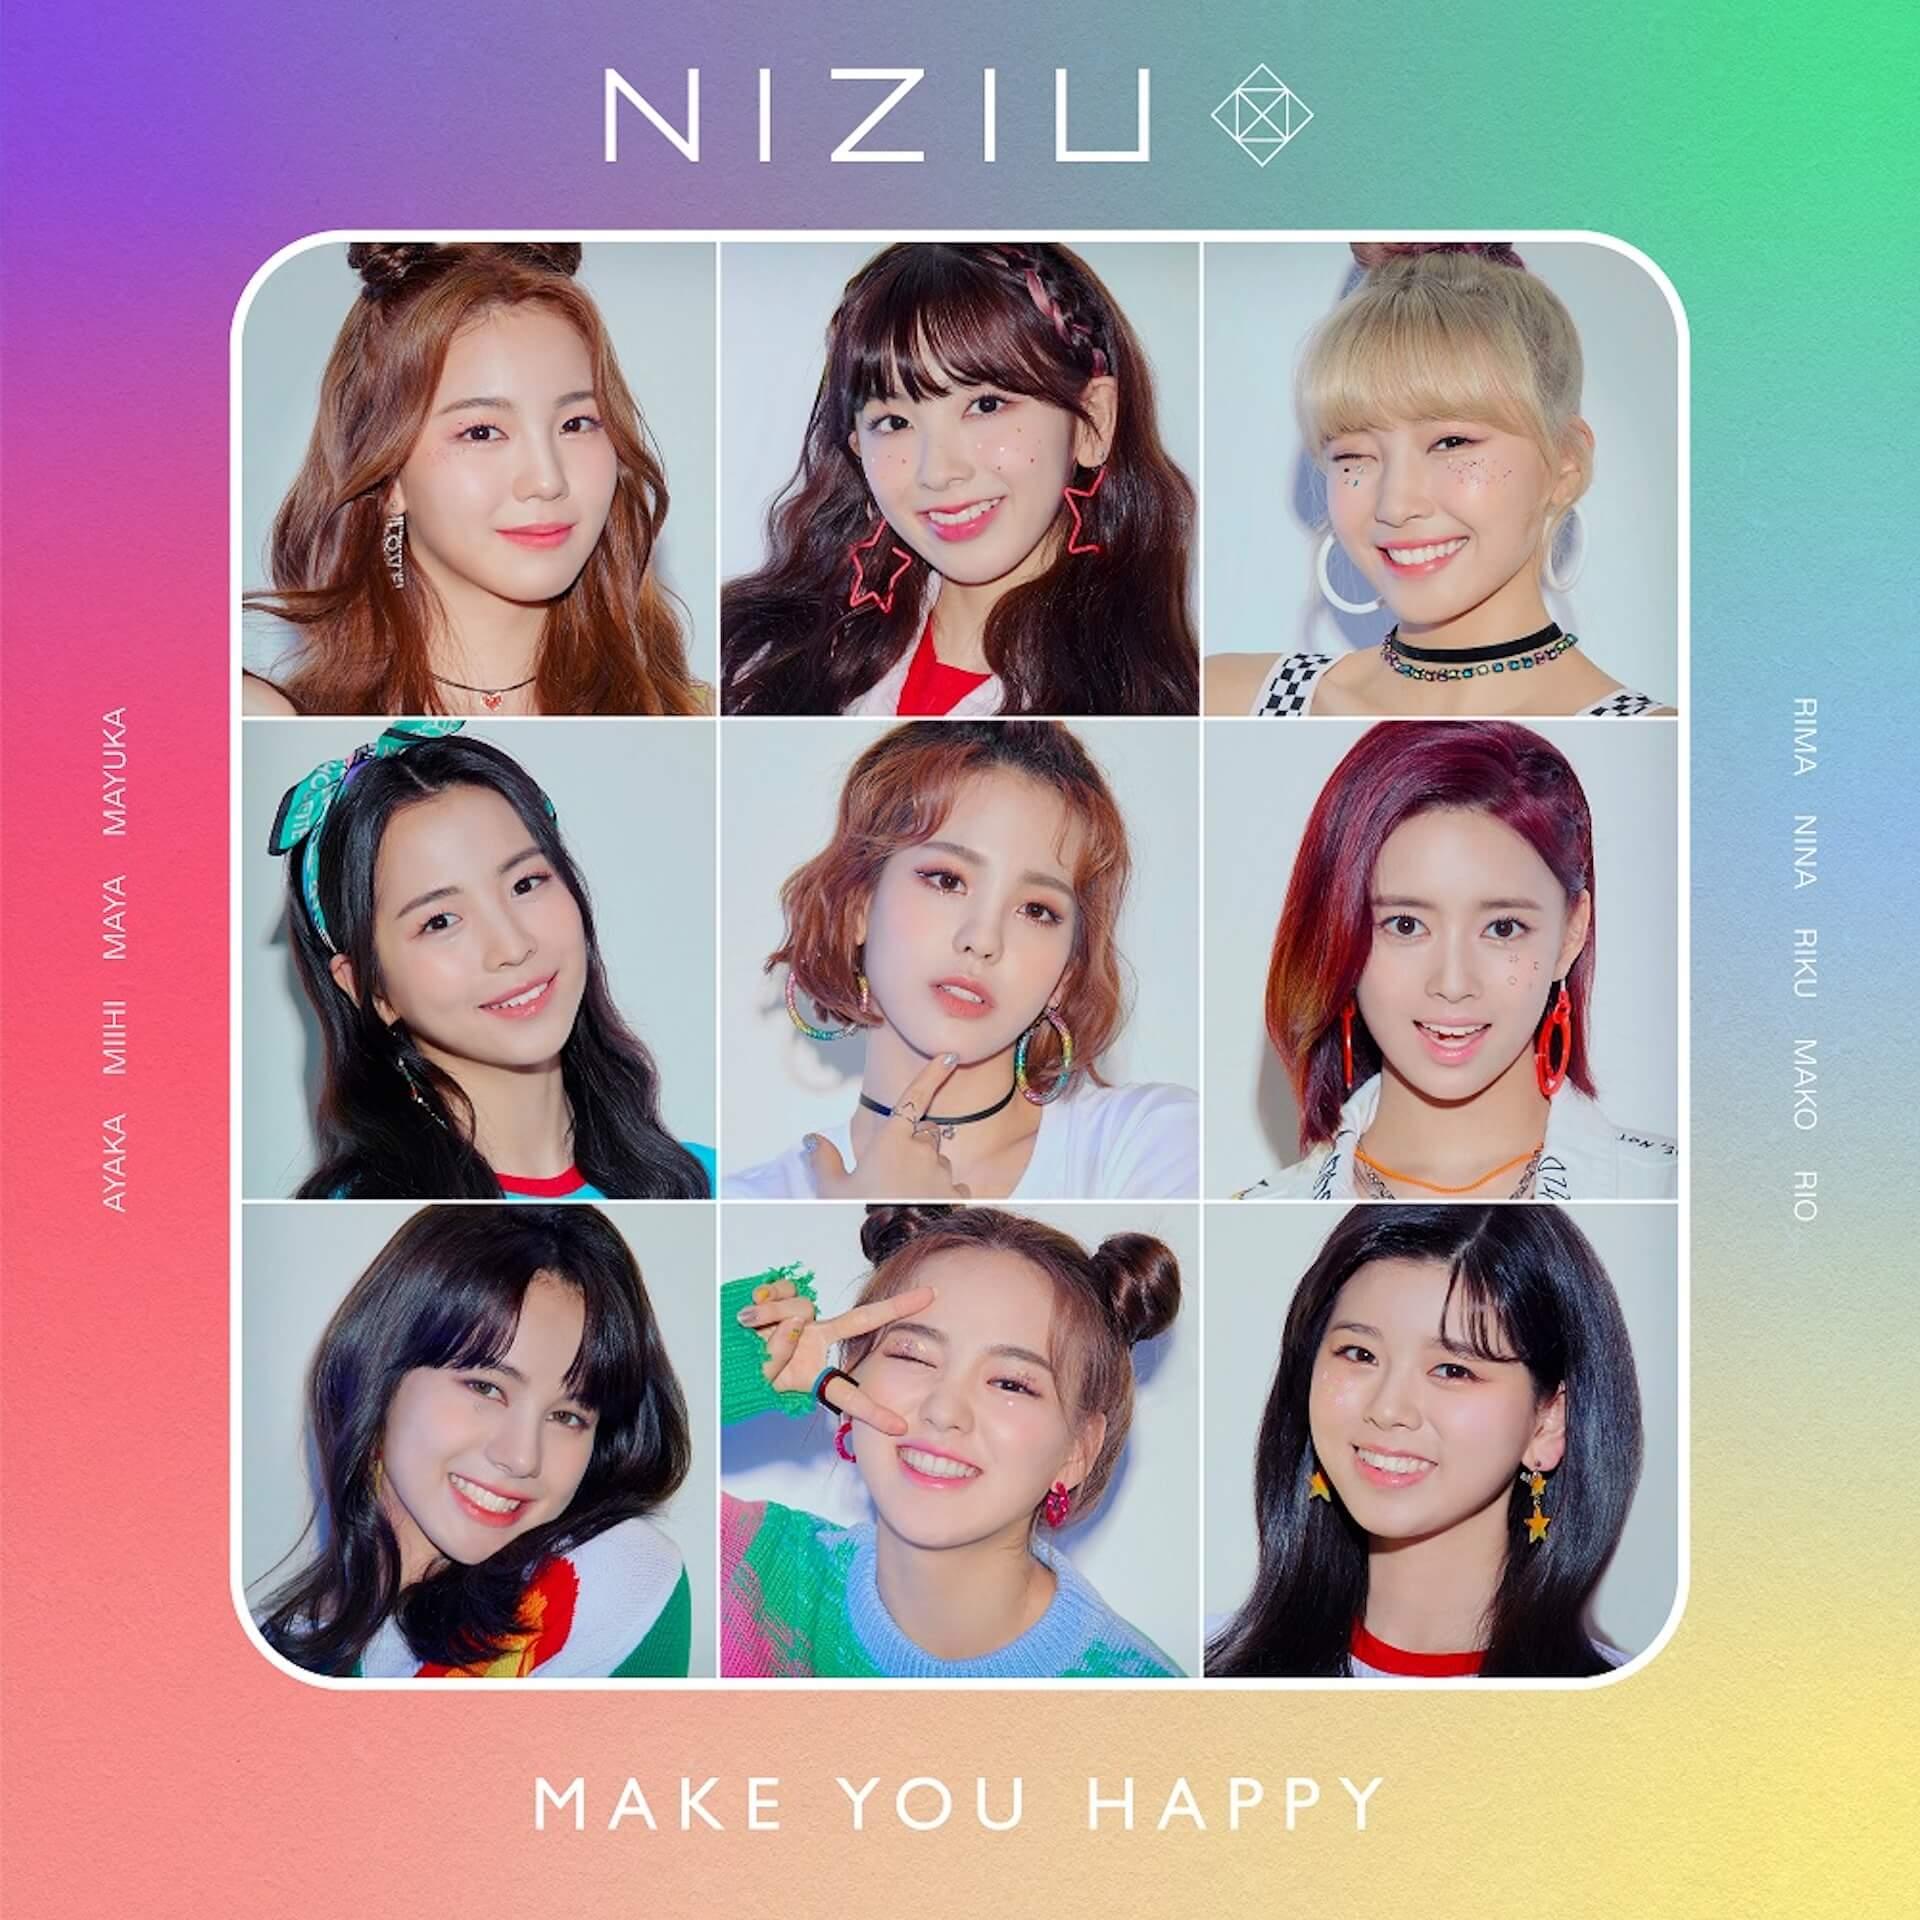 "NiziU初のミュージックビデオ""Make you happy""が公開初日に1,000万回再生を記録!ファンクラブ「WithU」も本日プレオープン music200701_niziu_mv_7"